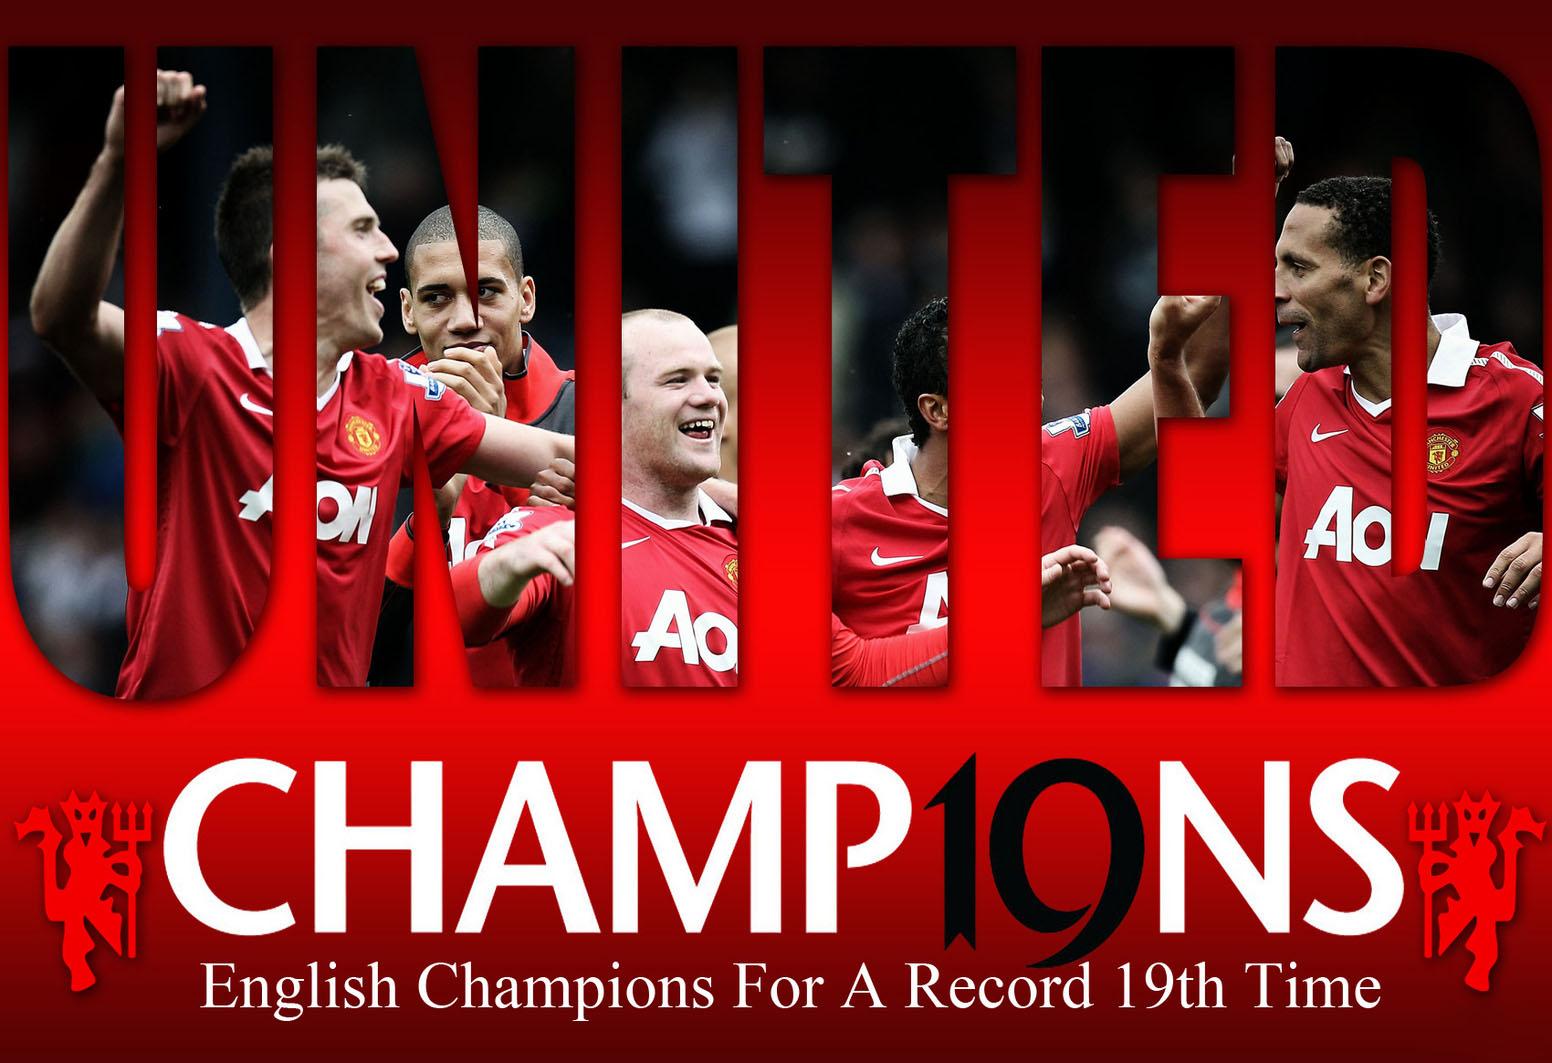 manchester united champions premiere league 2010 2011 wallpaper 1552x1063